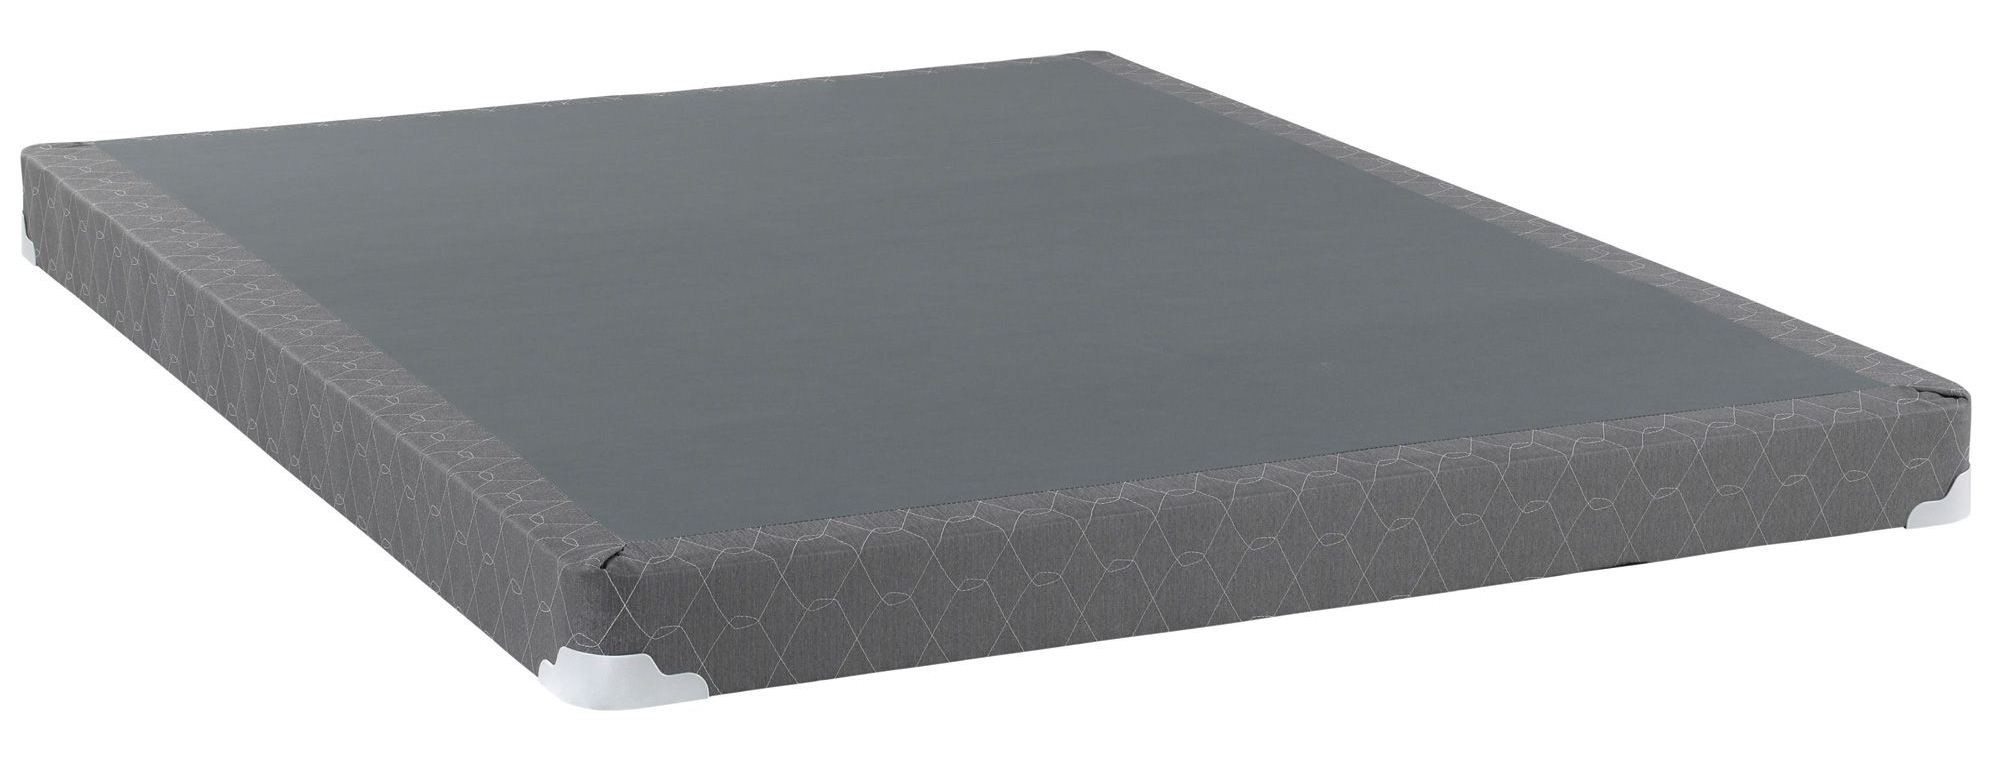 Full Mattress Bunkie Board Floor Bed